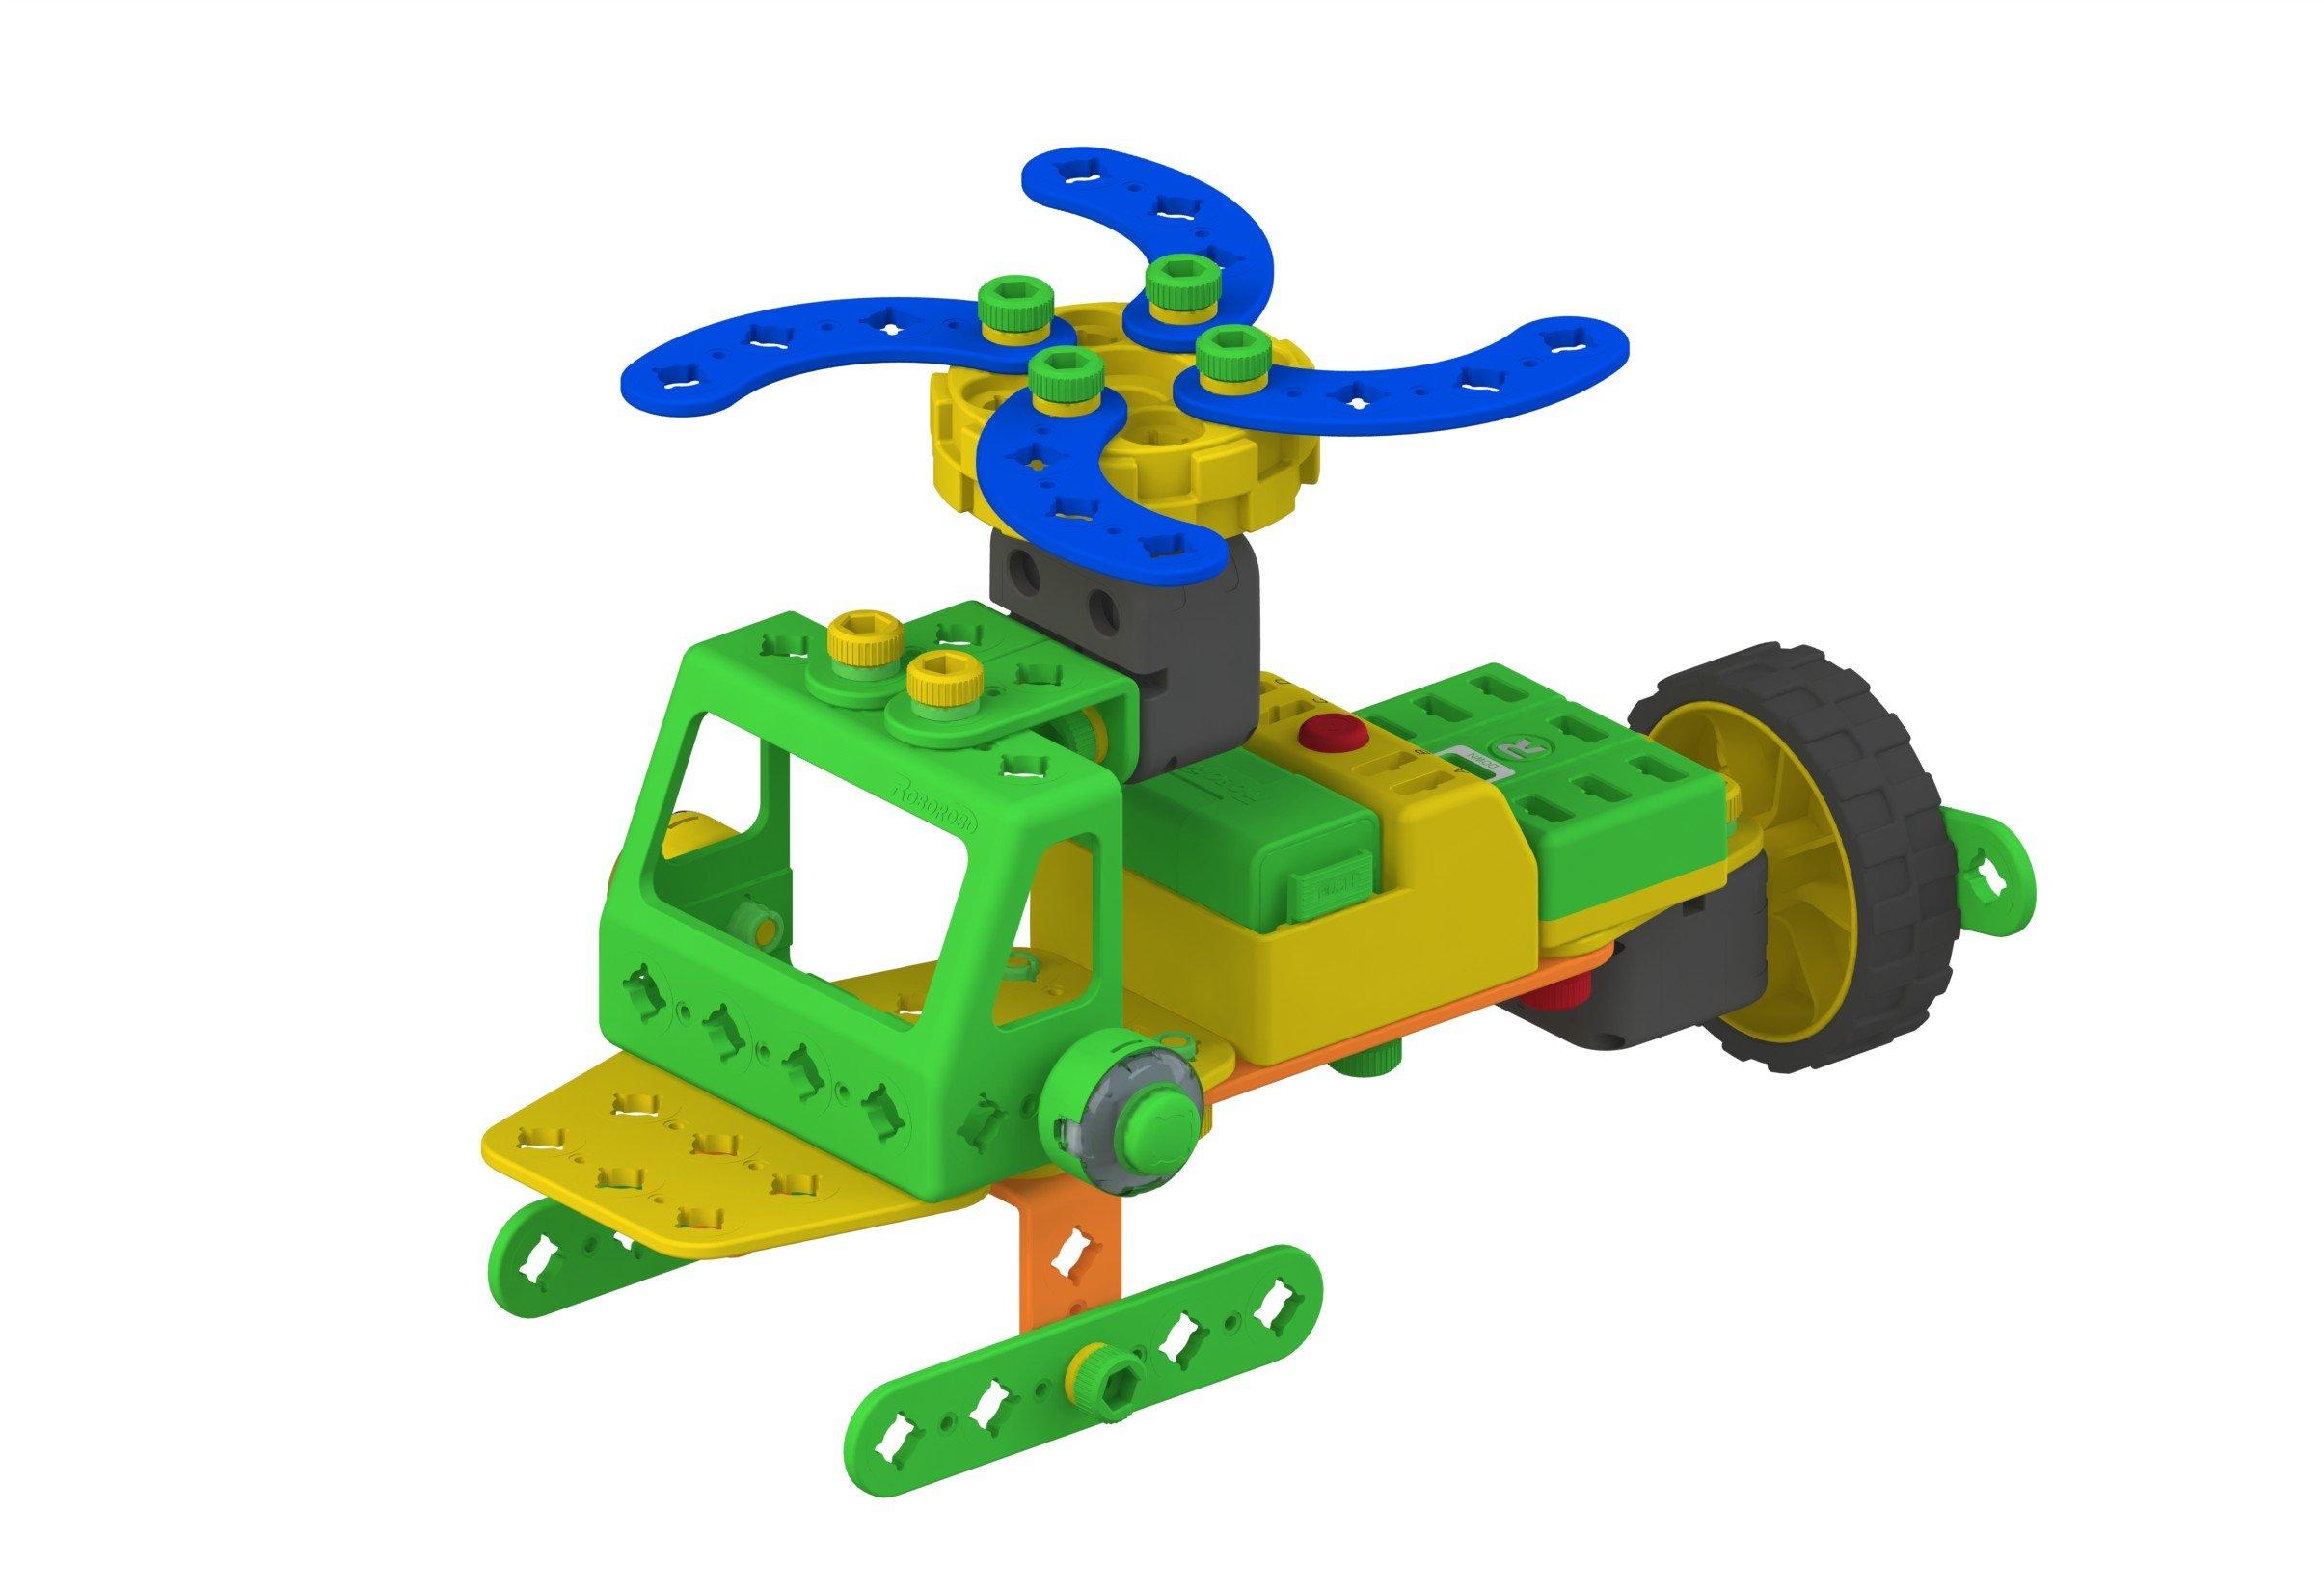 картинка Конструктор UARO ресурсный набор №2 1122313 (step 3) от магазина снабжение школ 2